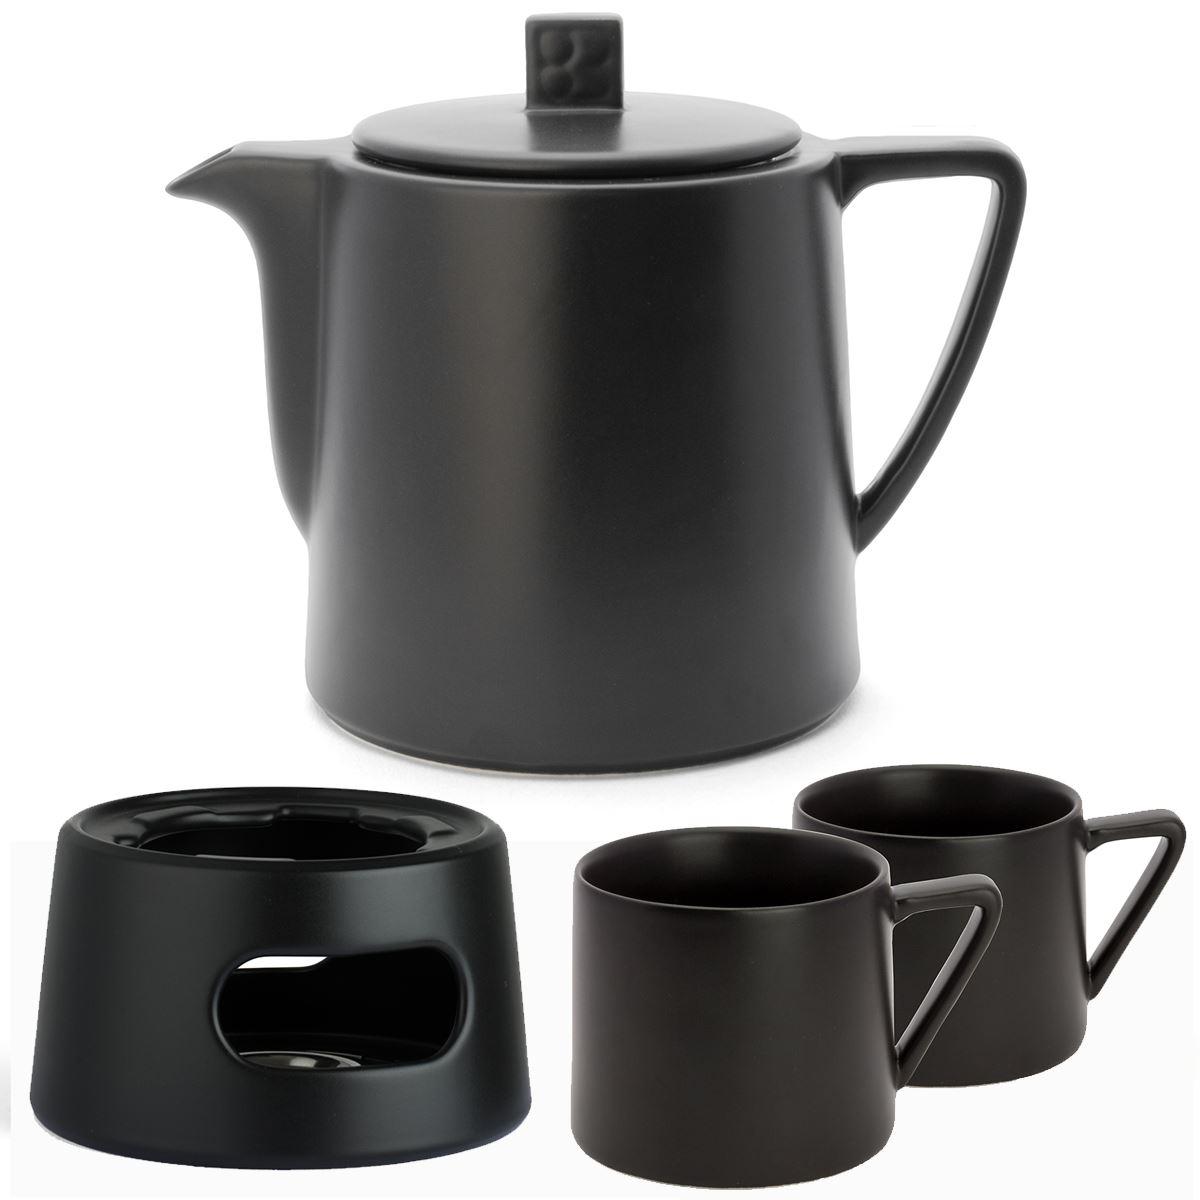 Teekanne Keramik Edelstahl-Sieb Teapot Teefilter Steingut-Kanne Tee grau 1,0 L